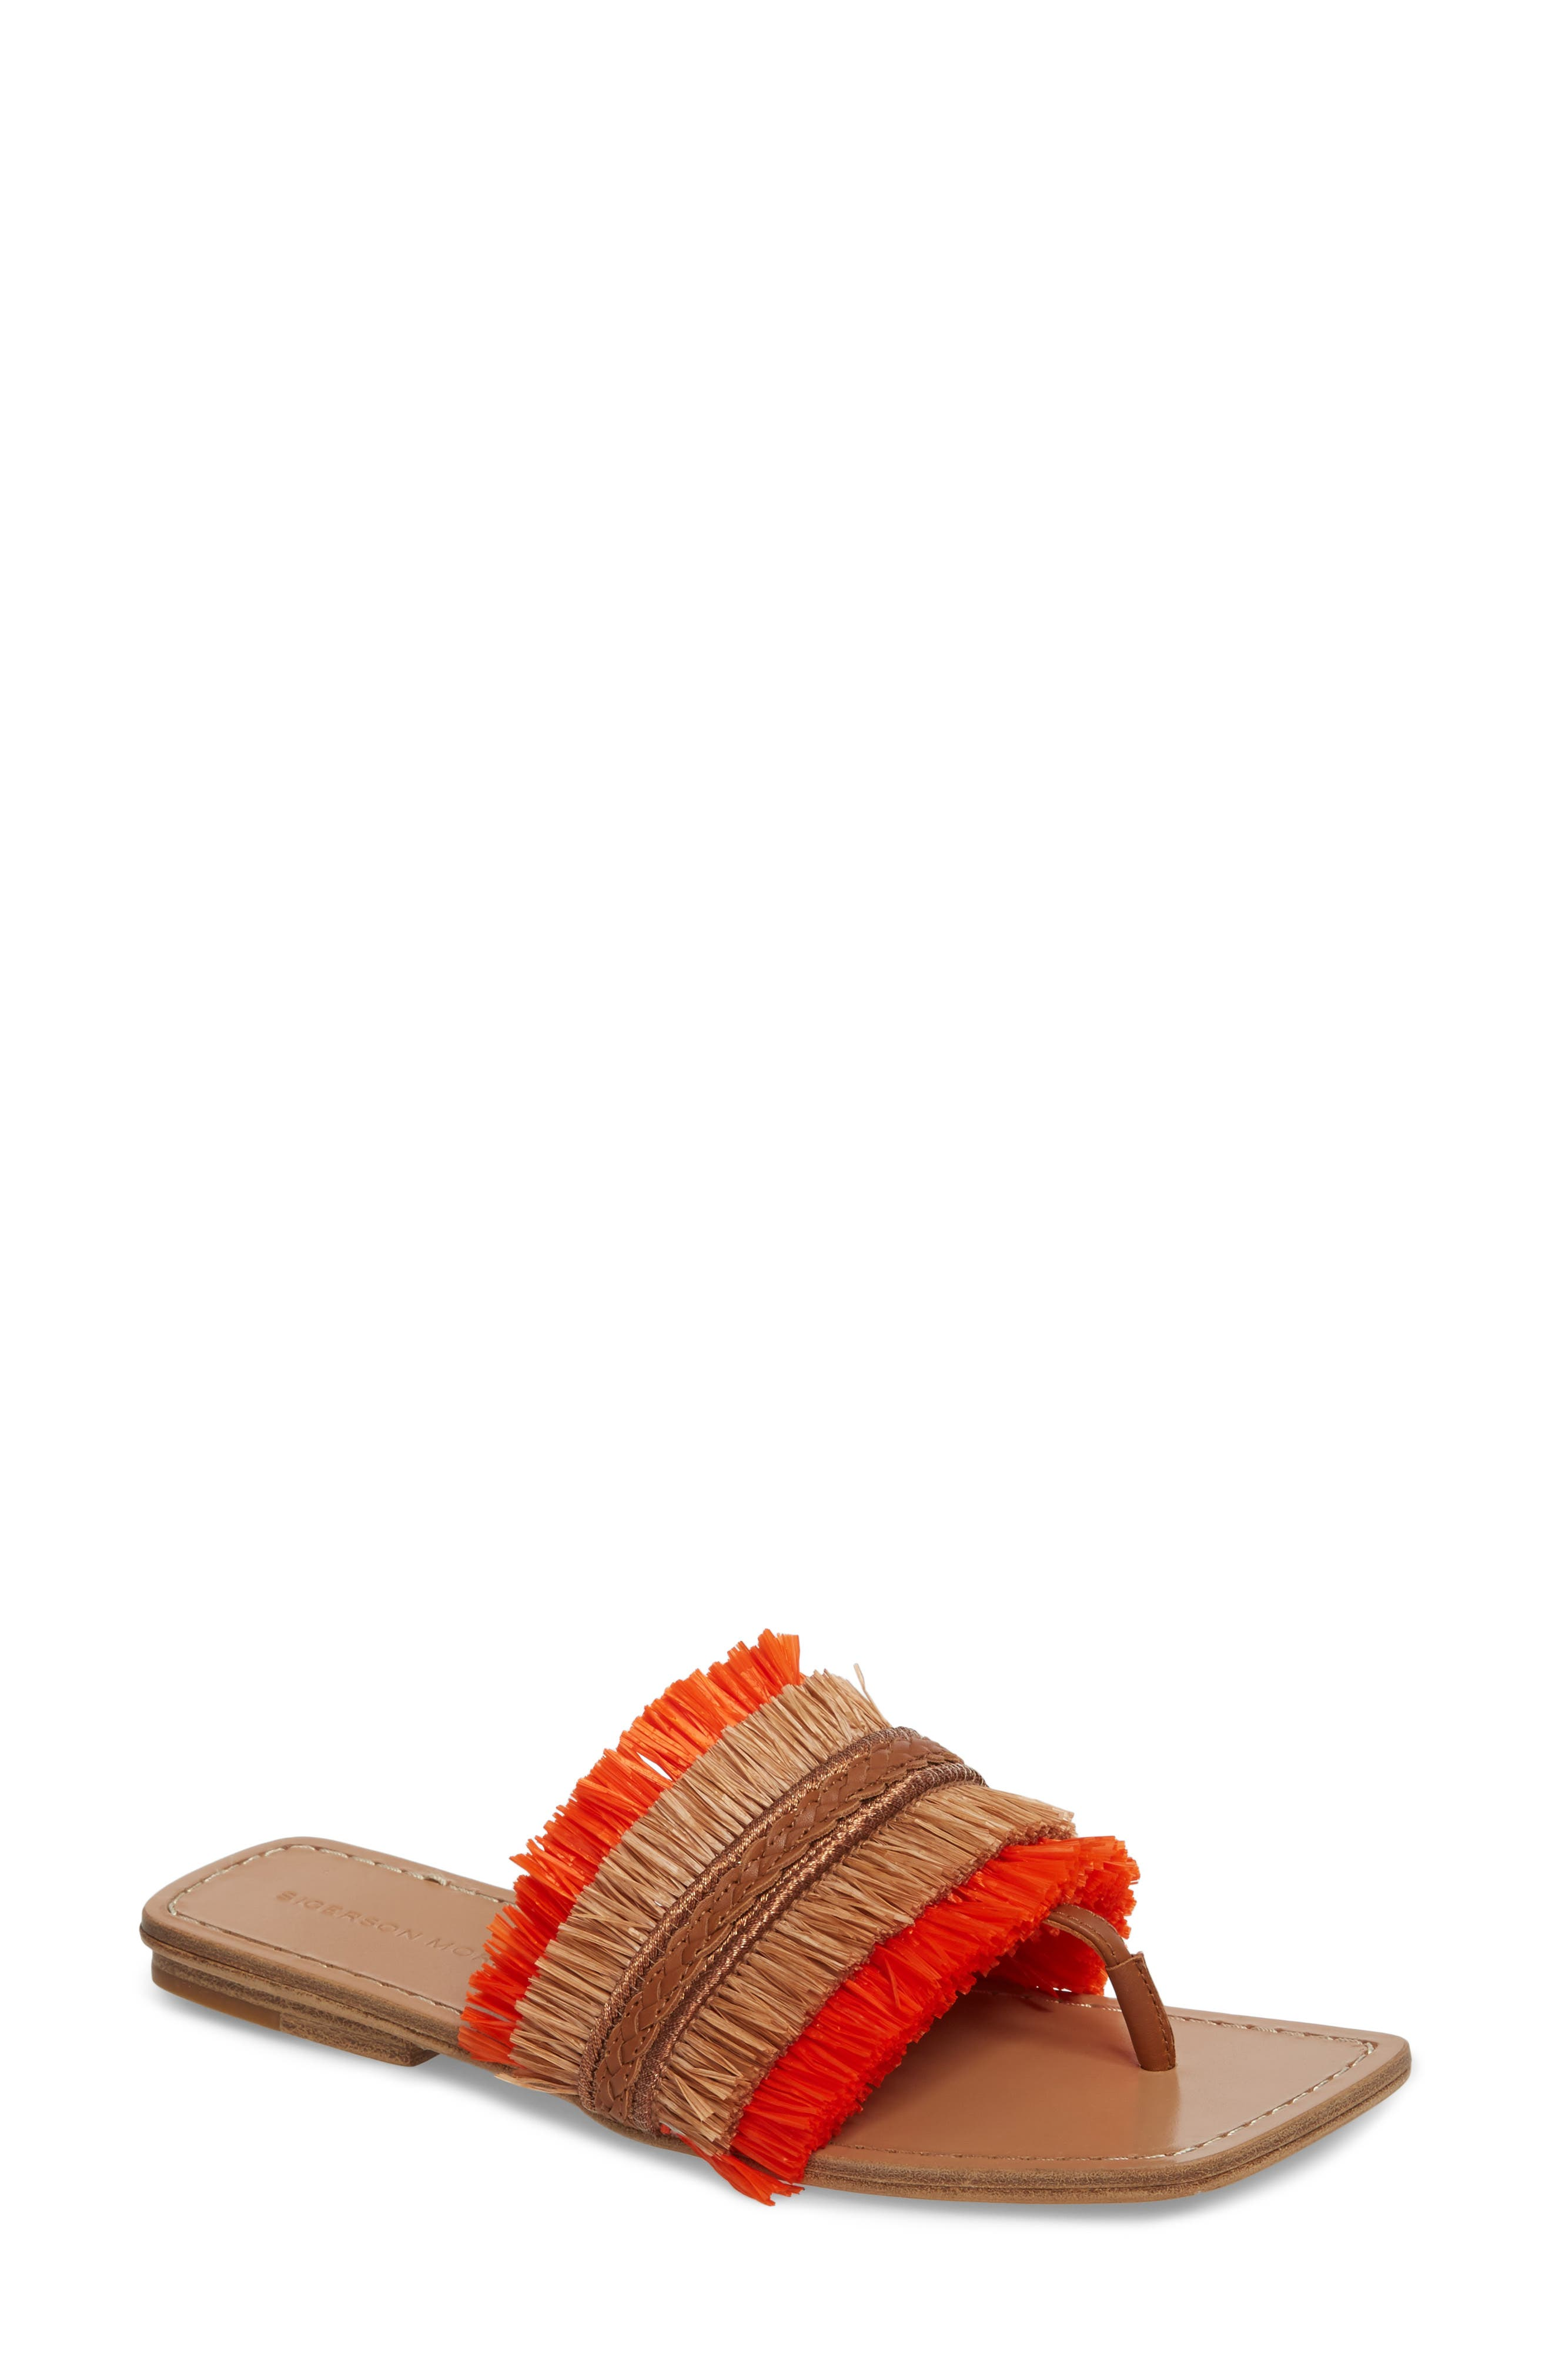 Woven Sandal,                             Main thumbnail 1, color,                             Tan/ Orange